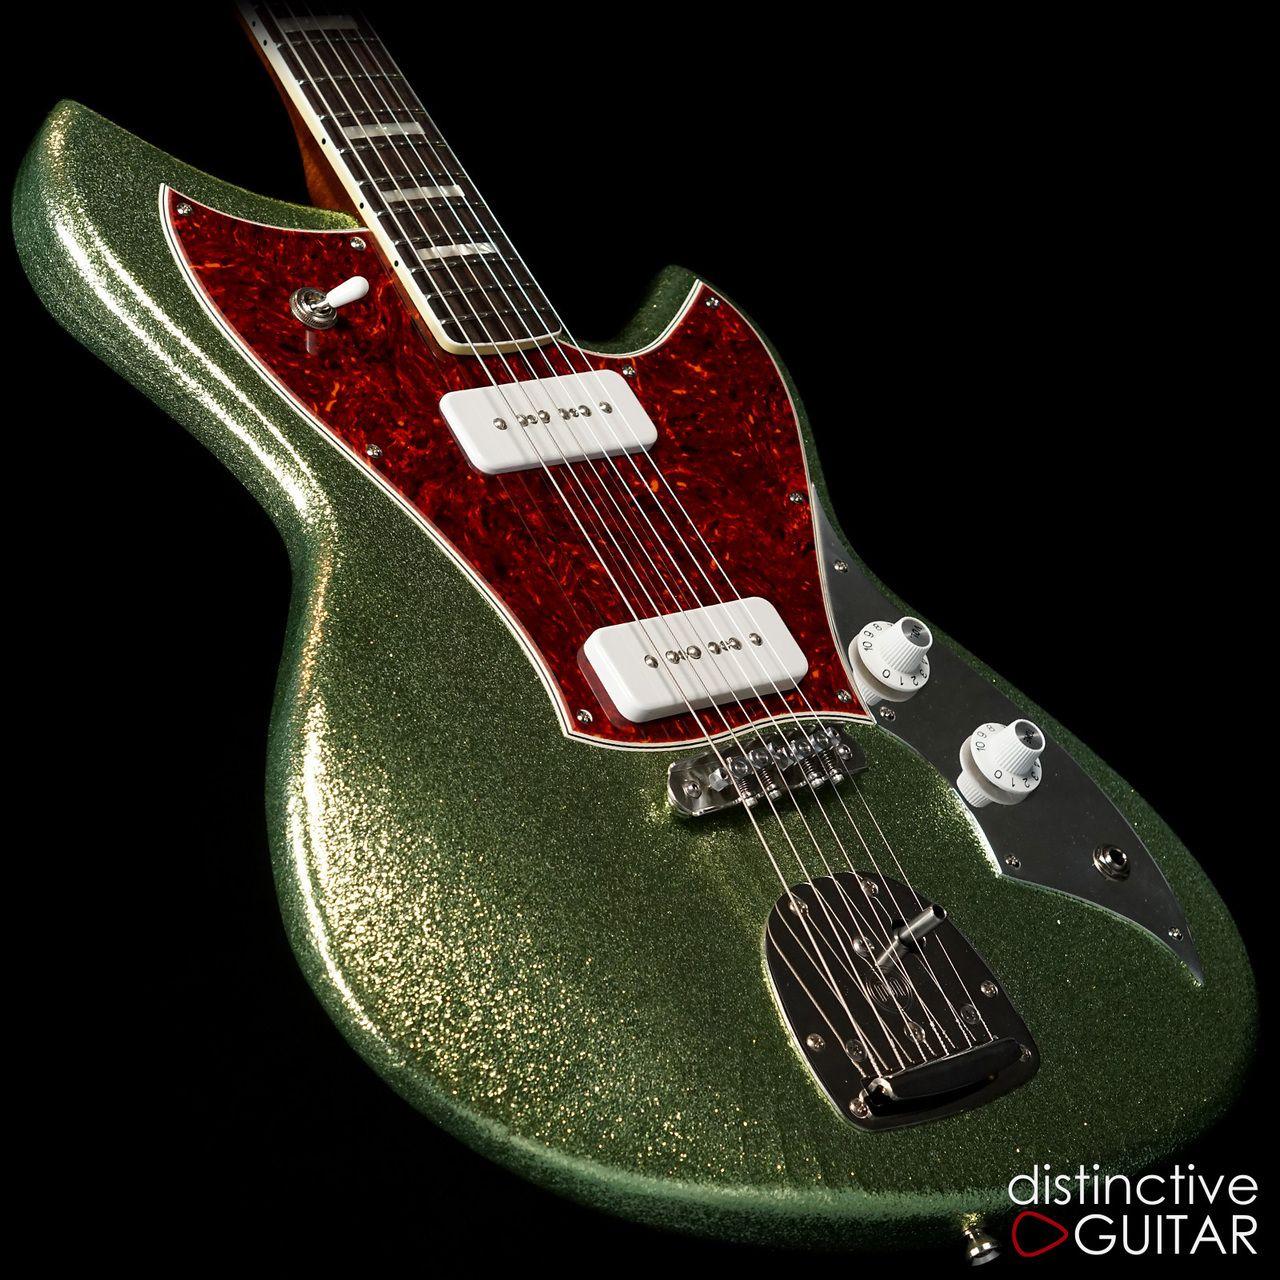 Novo Serus J Coke Bottle Green Sparkle Guitar Beautiful Guitars Guitar Inlay